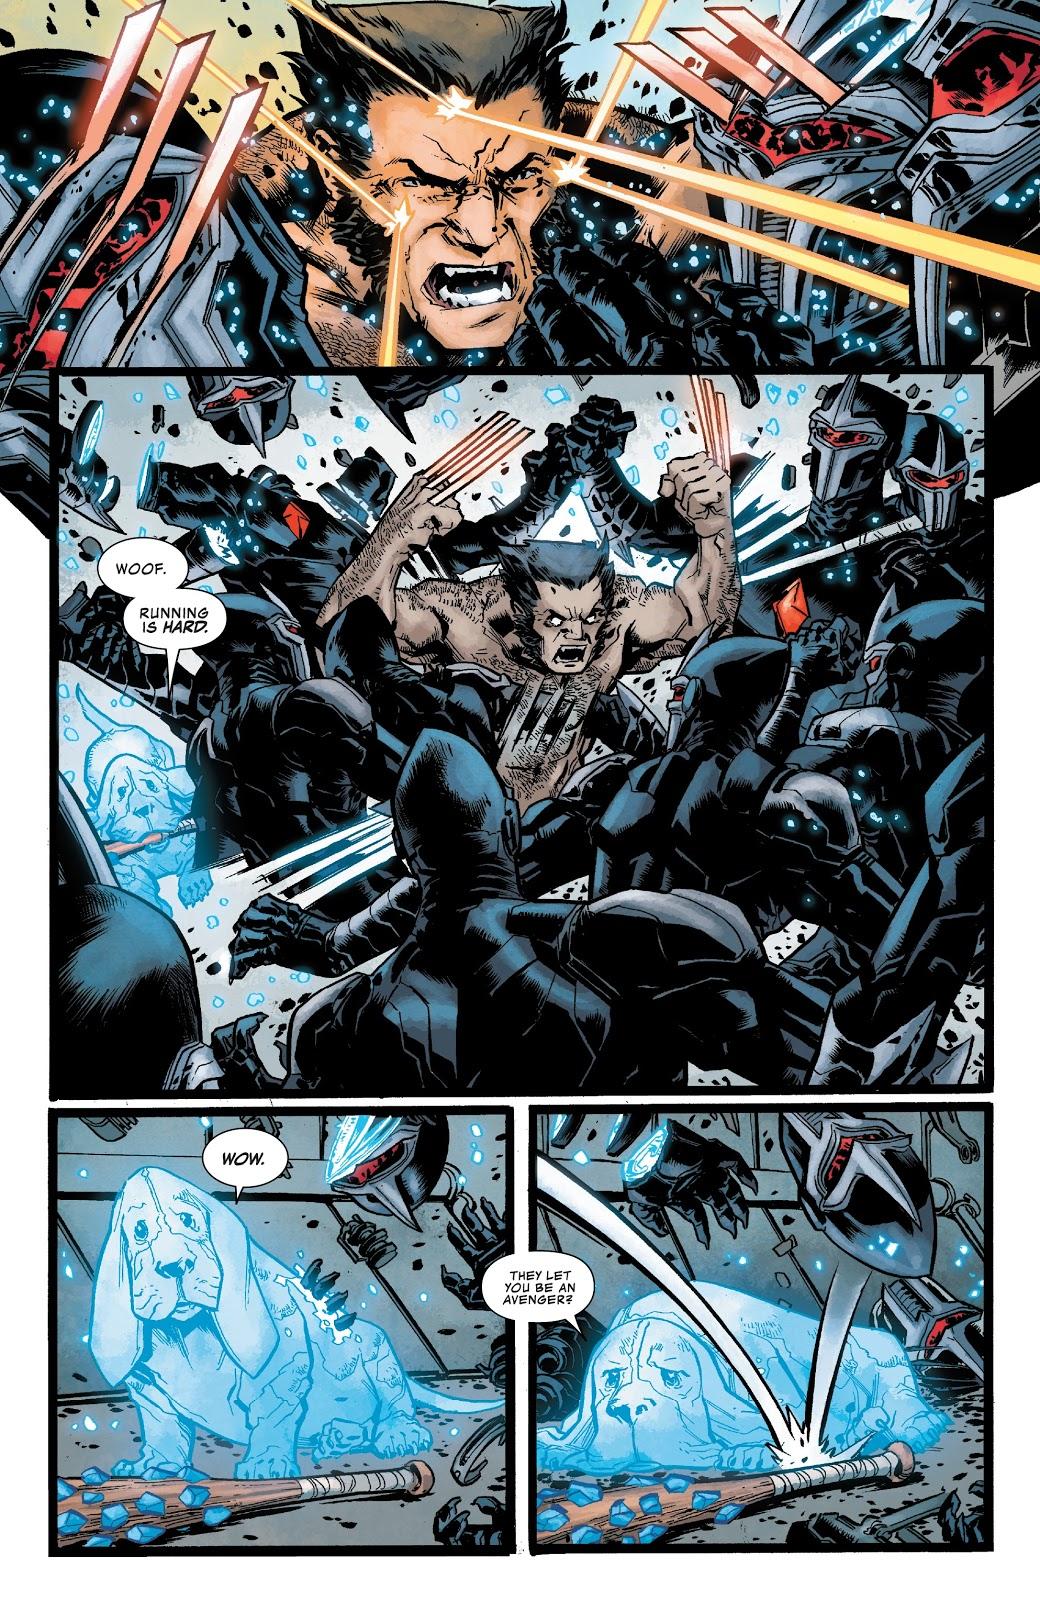 Wolverine: Infinity Watch— как Локи иРосомаха Камень Бесконечности защищали | Канобу - Изображение 5521